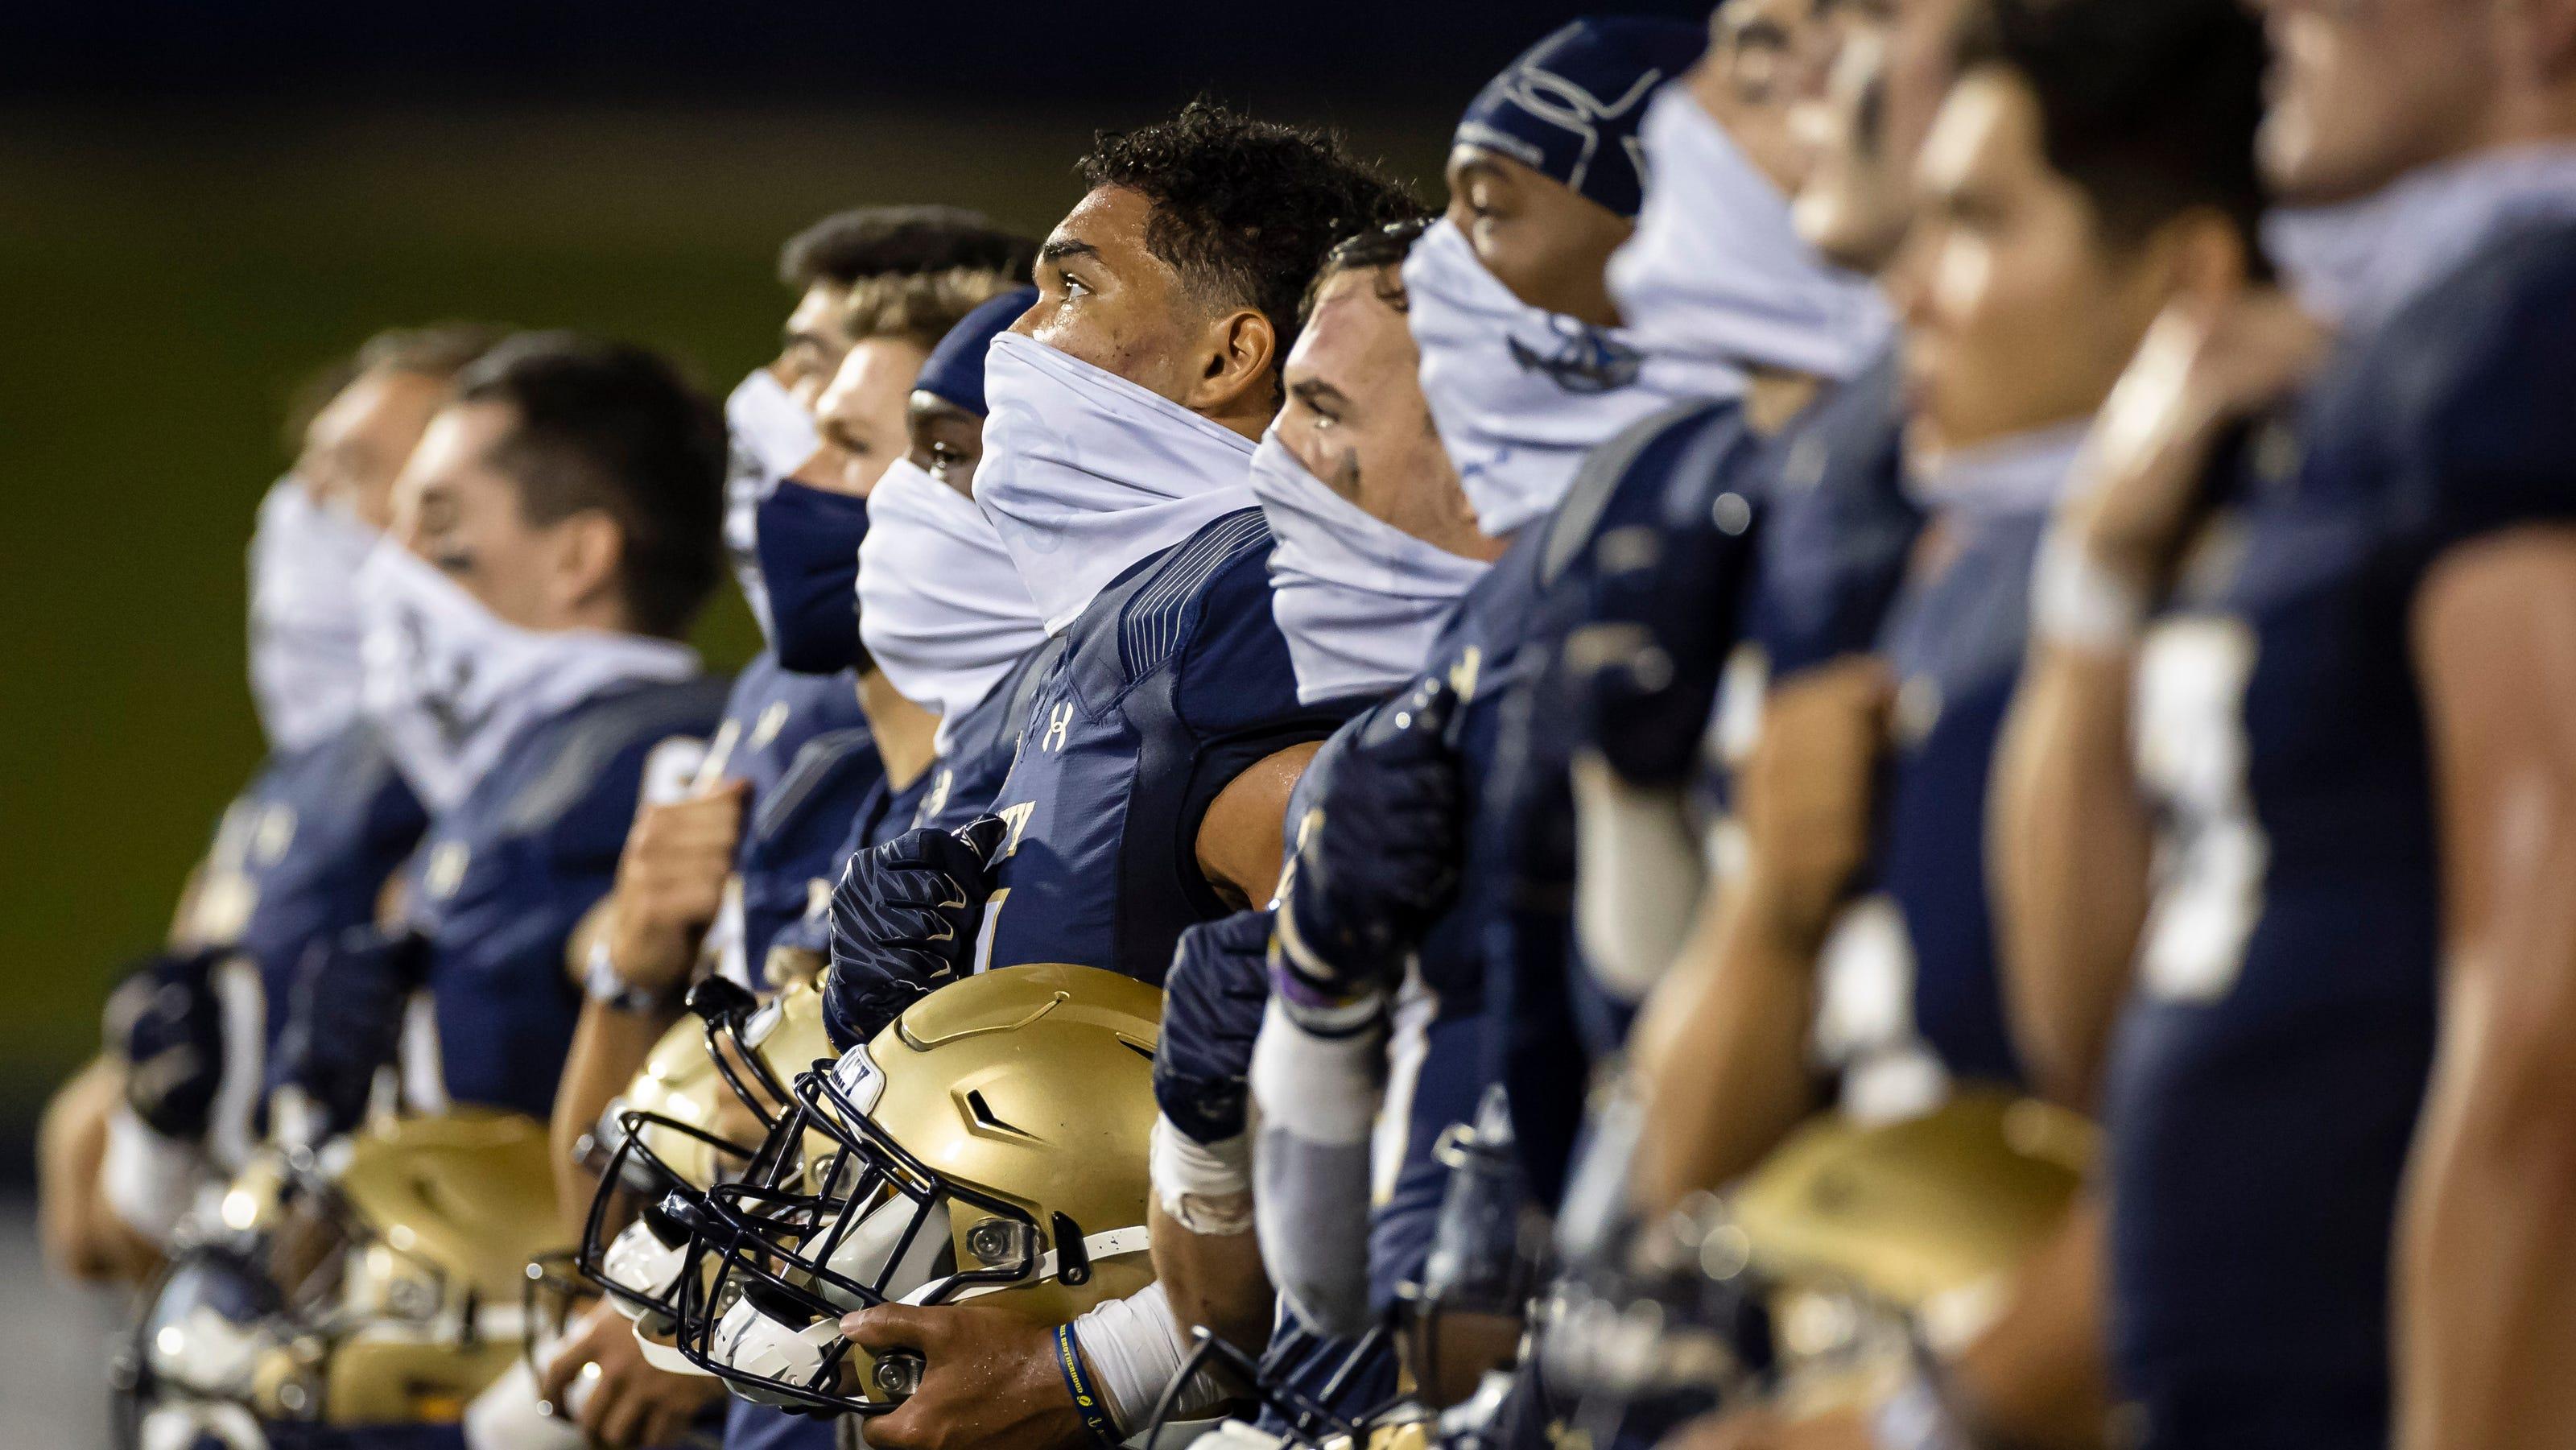 'Felt like a scrimmage': BYU-Navy puts college football's coronavirus era into national spotlight